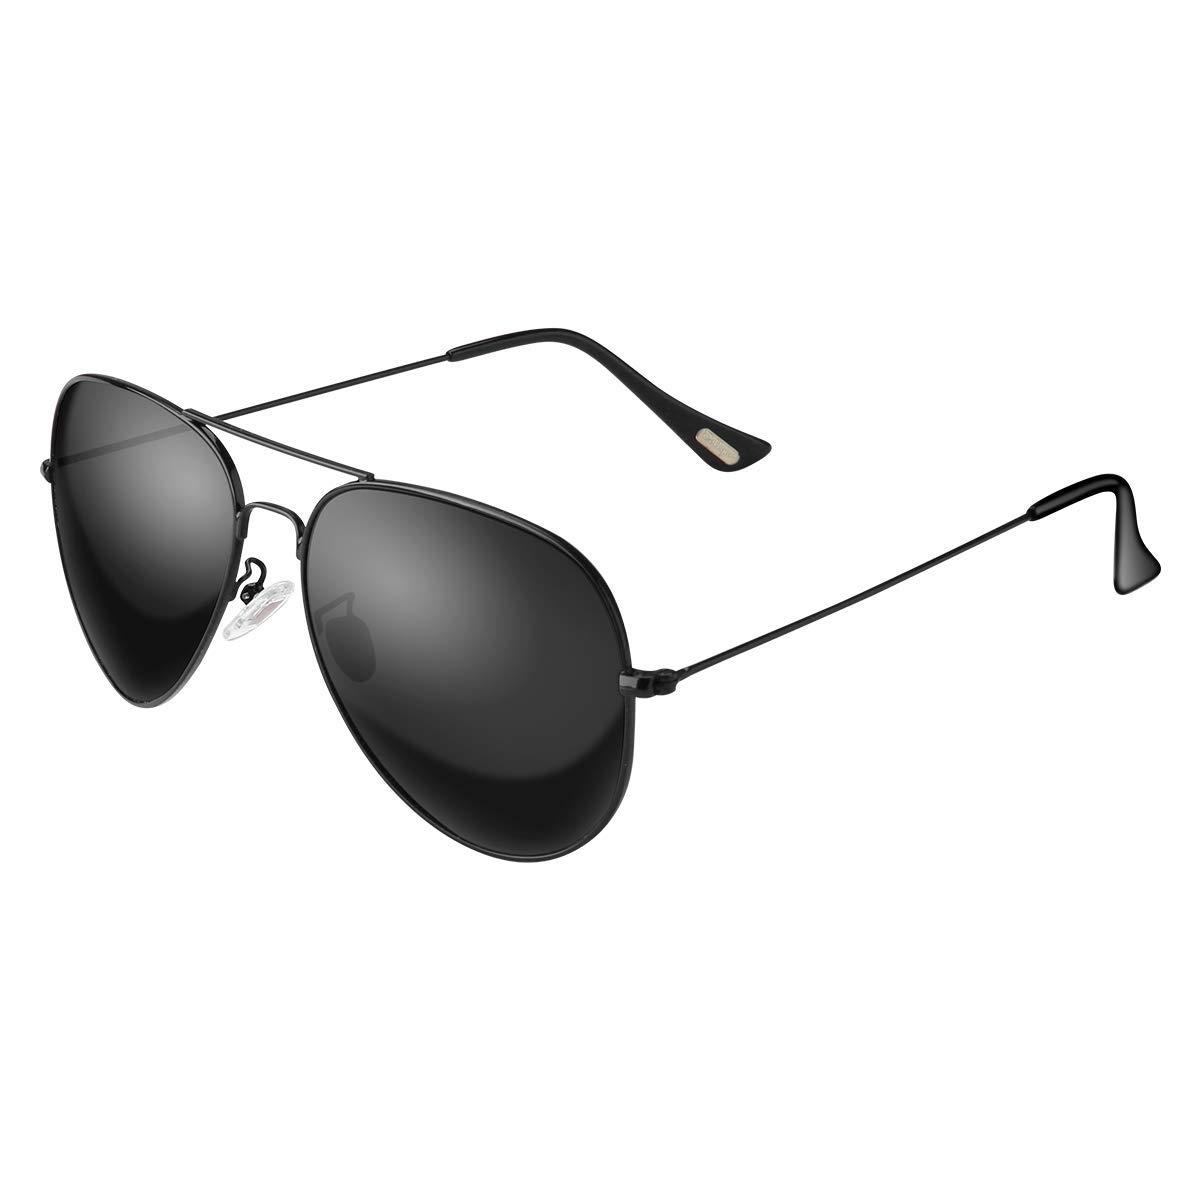 606fe1048e80 Amazon.com  Polarized Aviator Sunglasses for Men and Women Oversized  Mirrored Sun Glasses UV400 Protection  Clothing